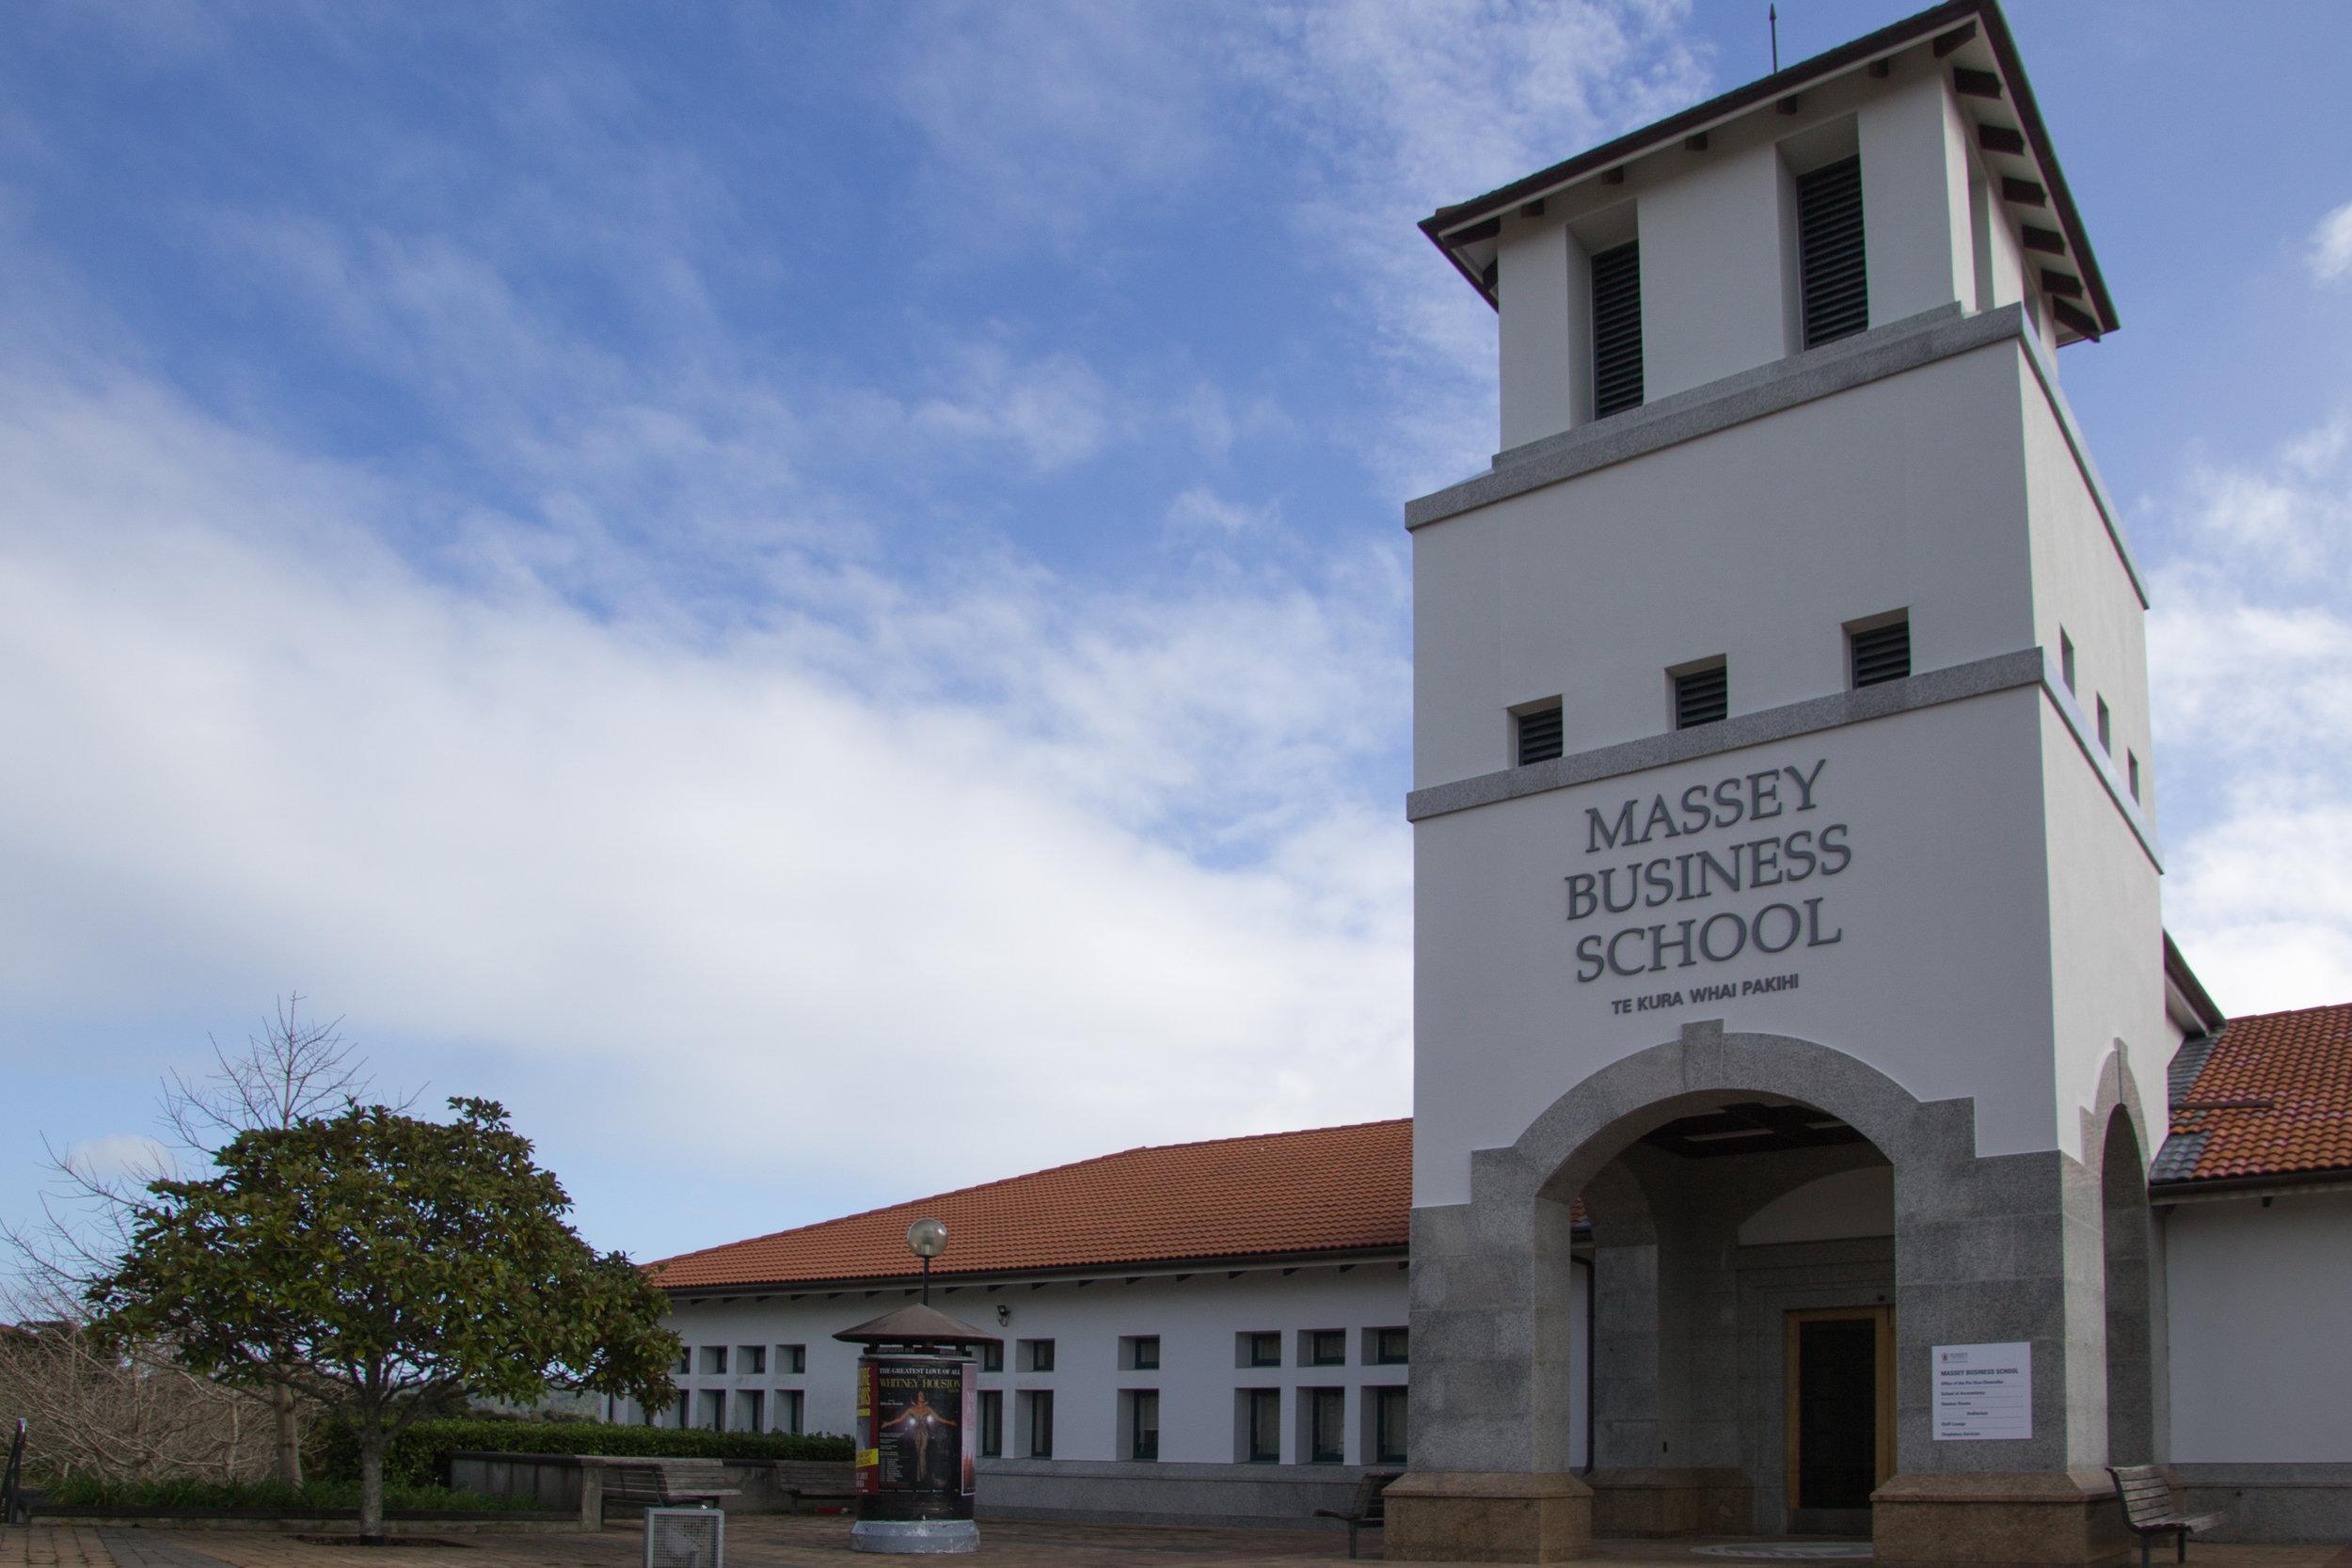 Beasiswa bisnis Massey University, Selandia Baru